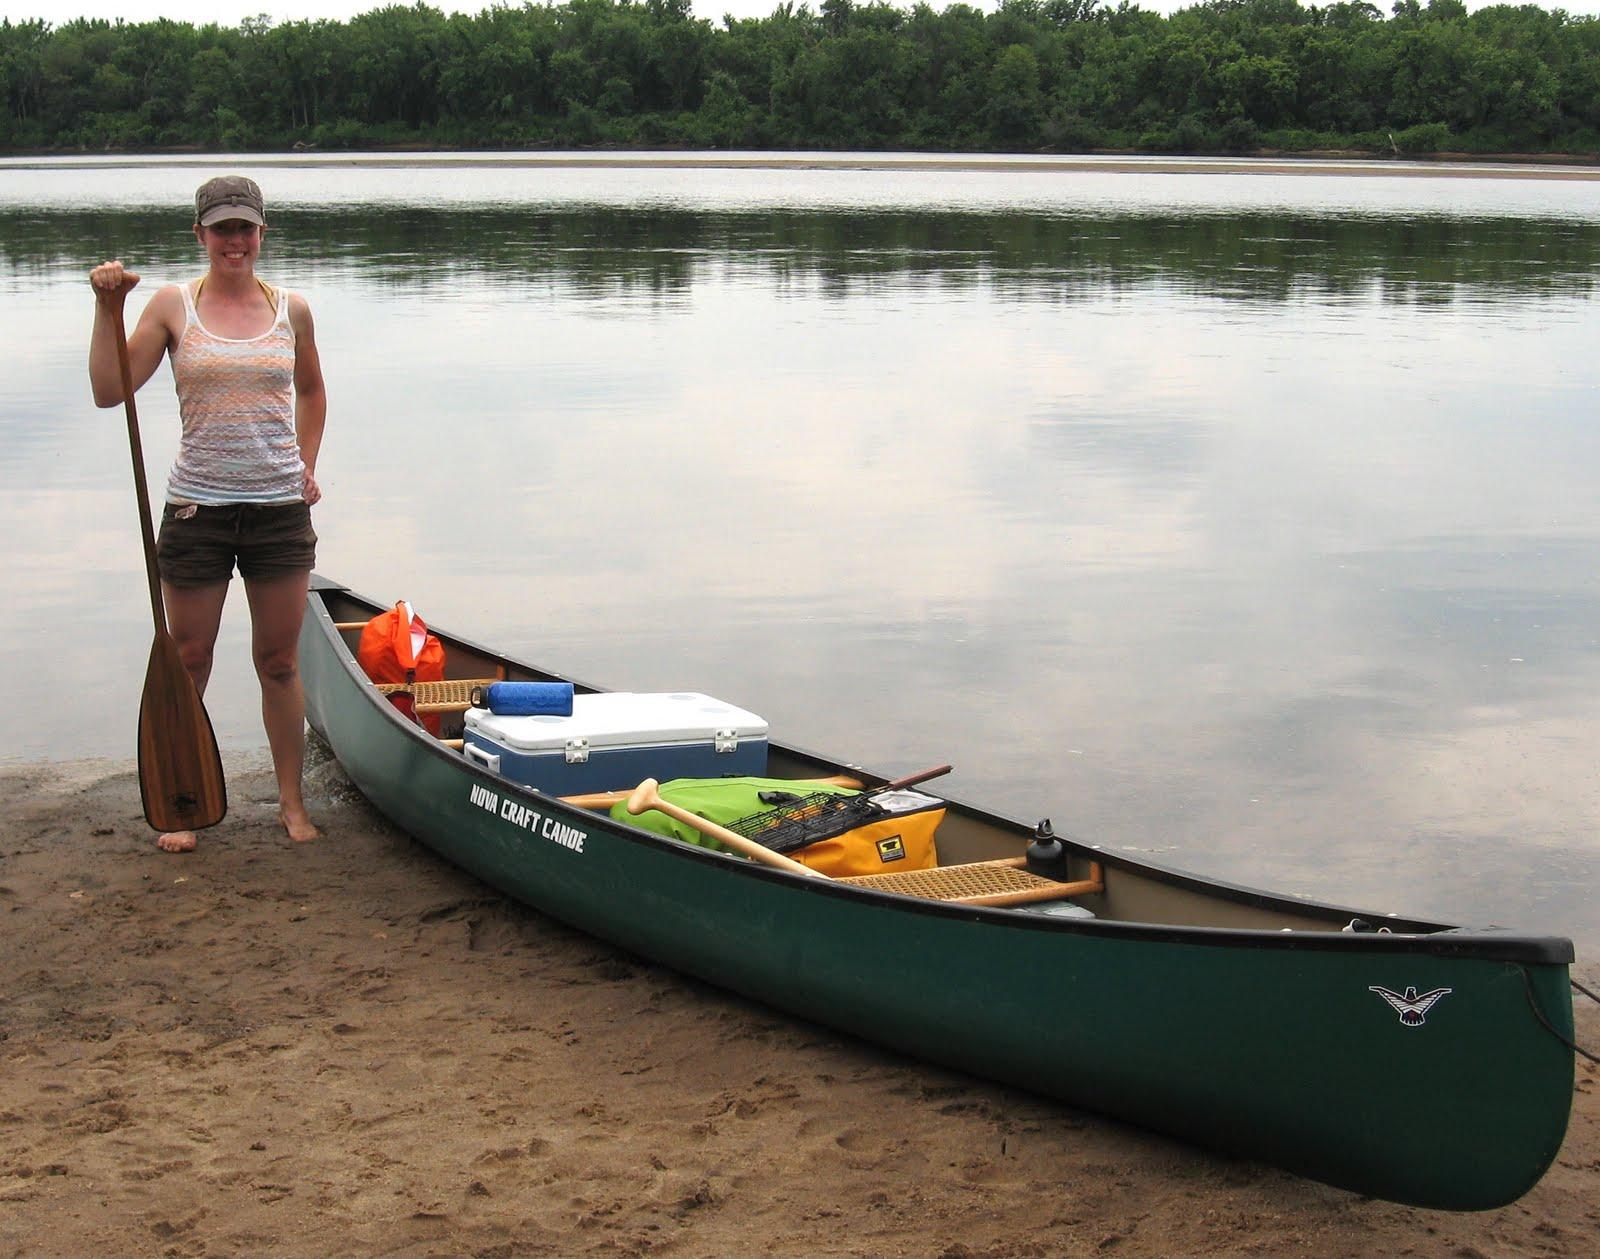 Cool Canoe Paint Jobs